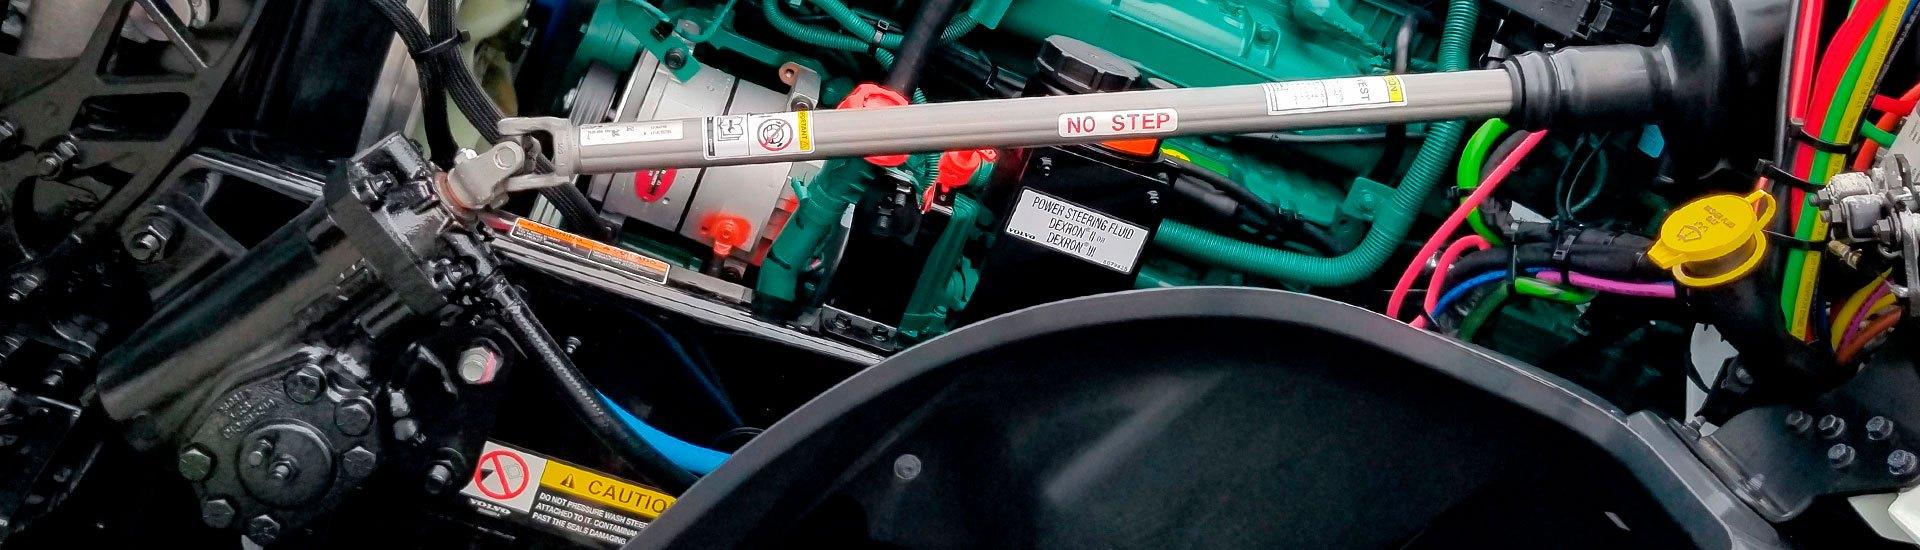 Semi Truck Steering Parts | Racks, Pumps, Tie Rods, Columns